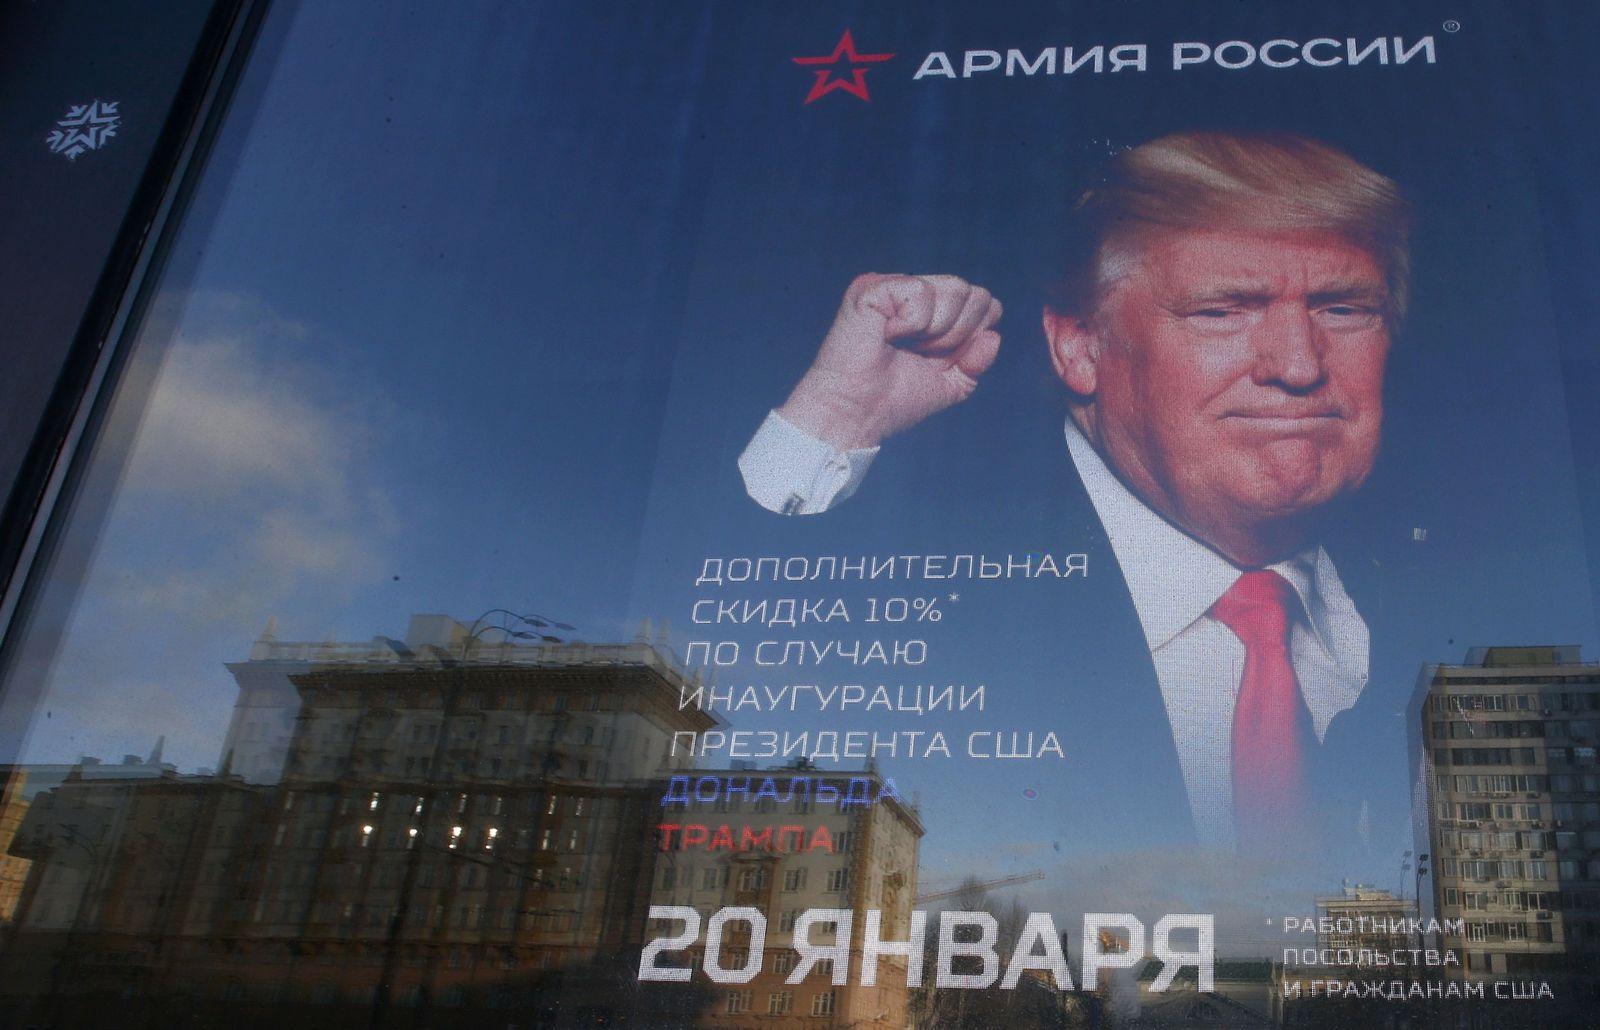 Russland / Trump / Armeeposter